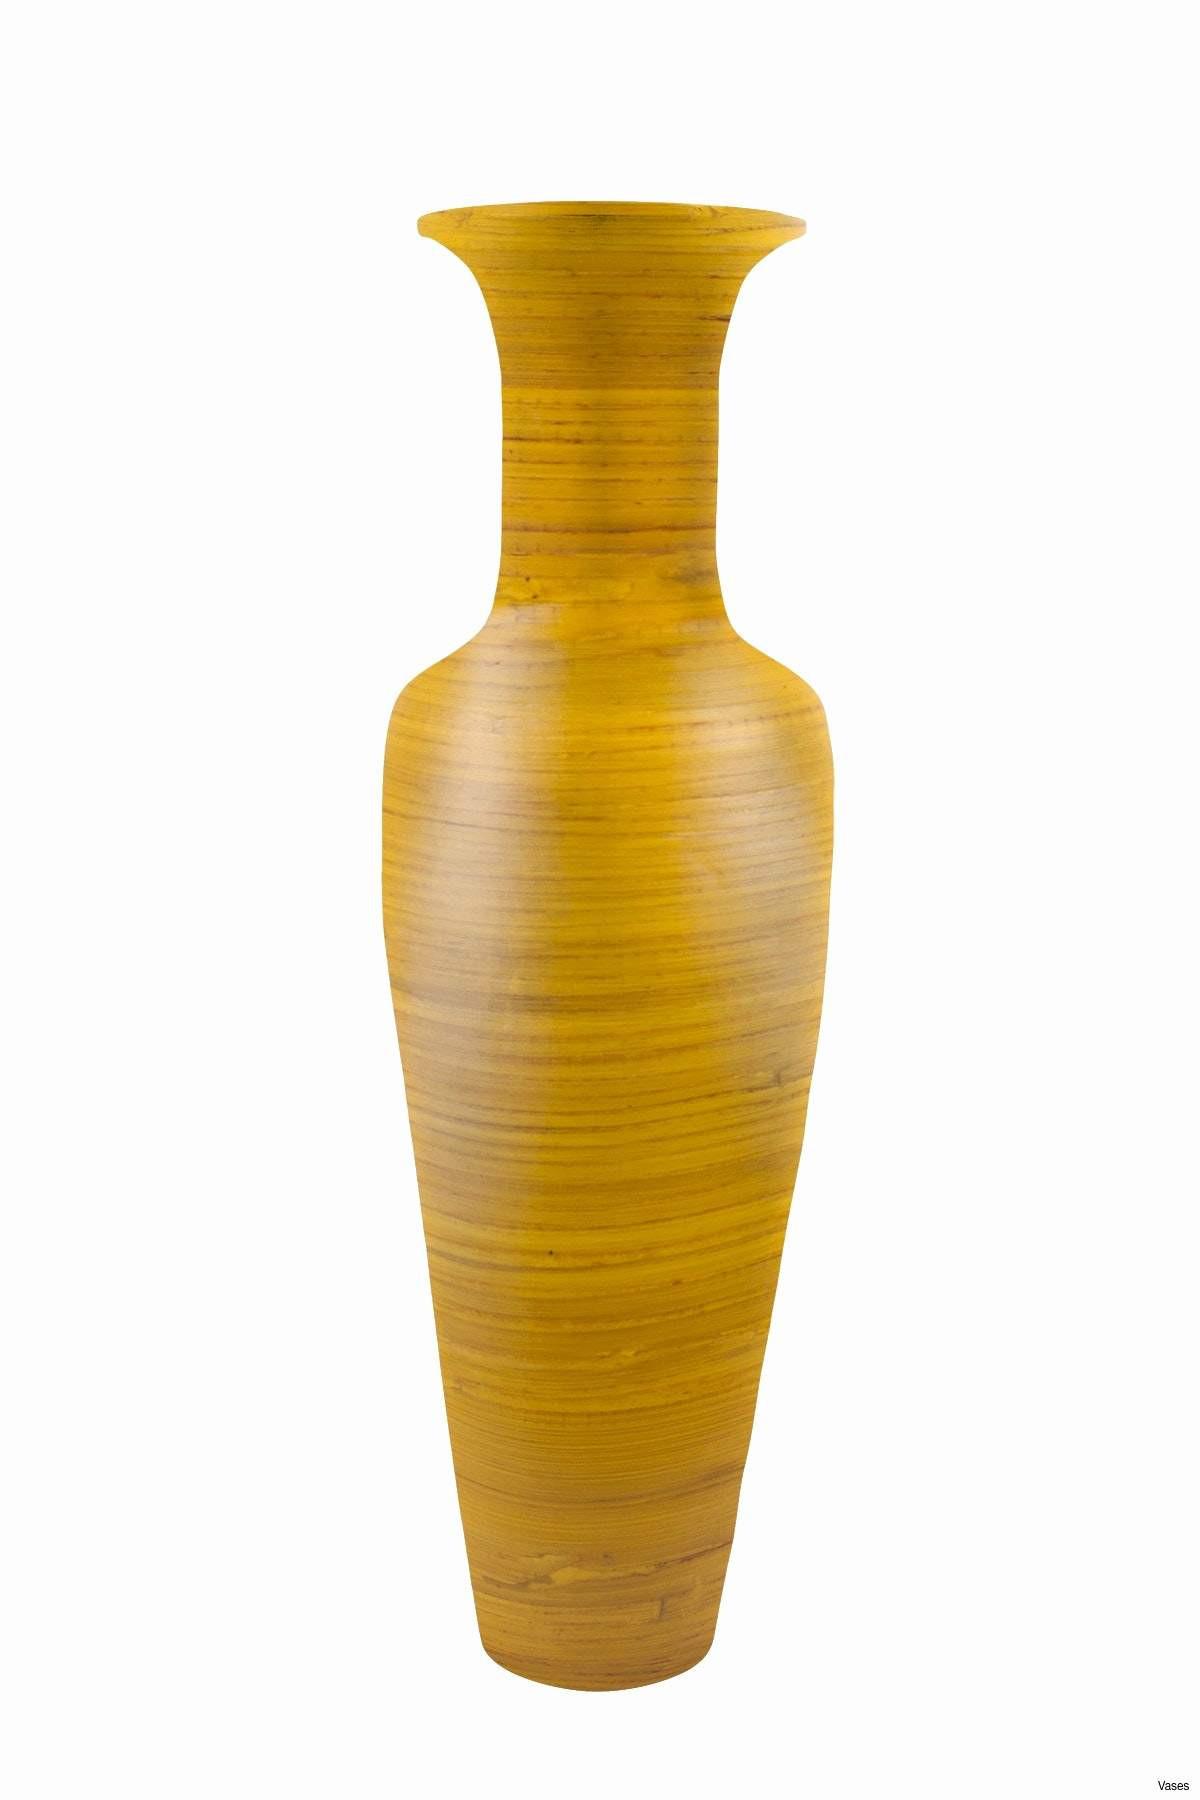 set of 3 glass vases of vases set of 3 photos vases floating candle vase set glass holdersi regarding vases set of 3 images area floor rugs new joaquin gray vases set 3 2h pottery